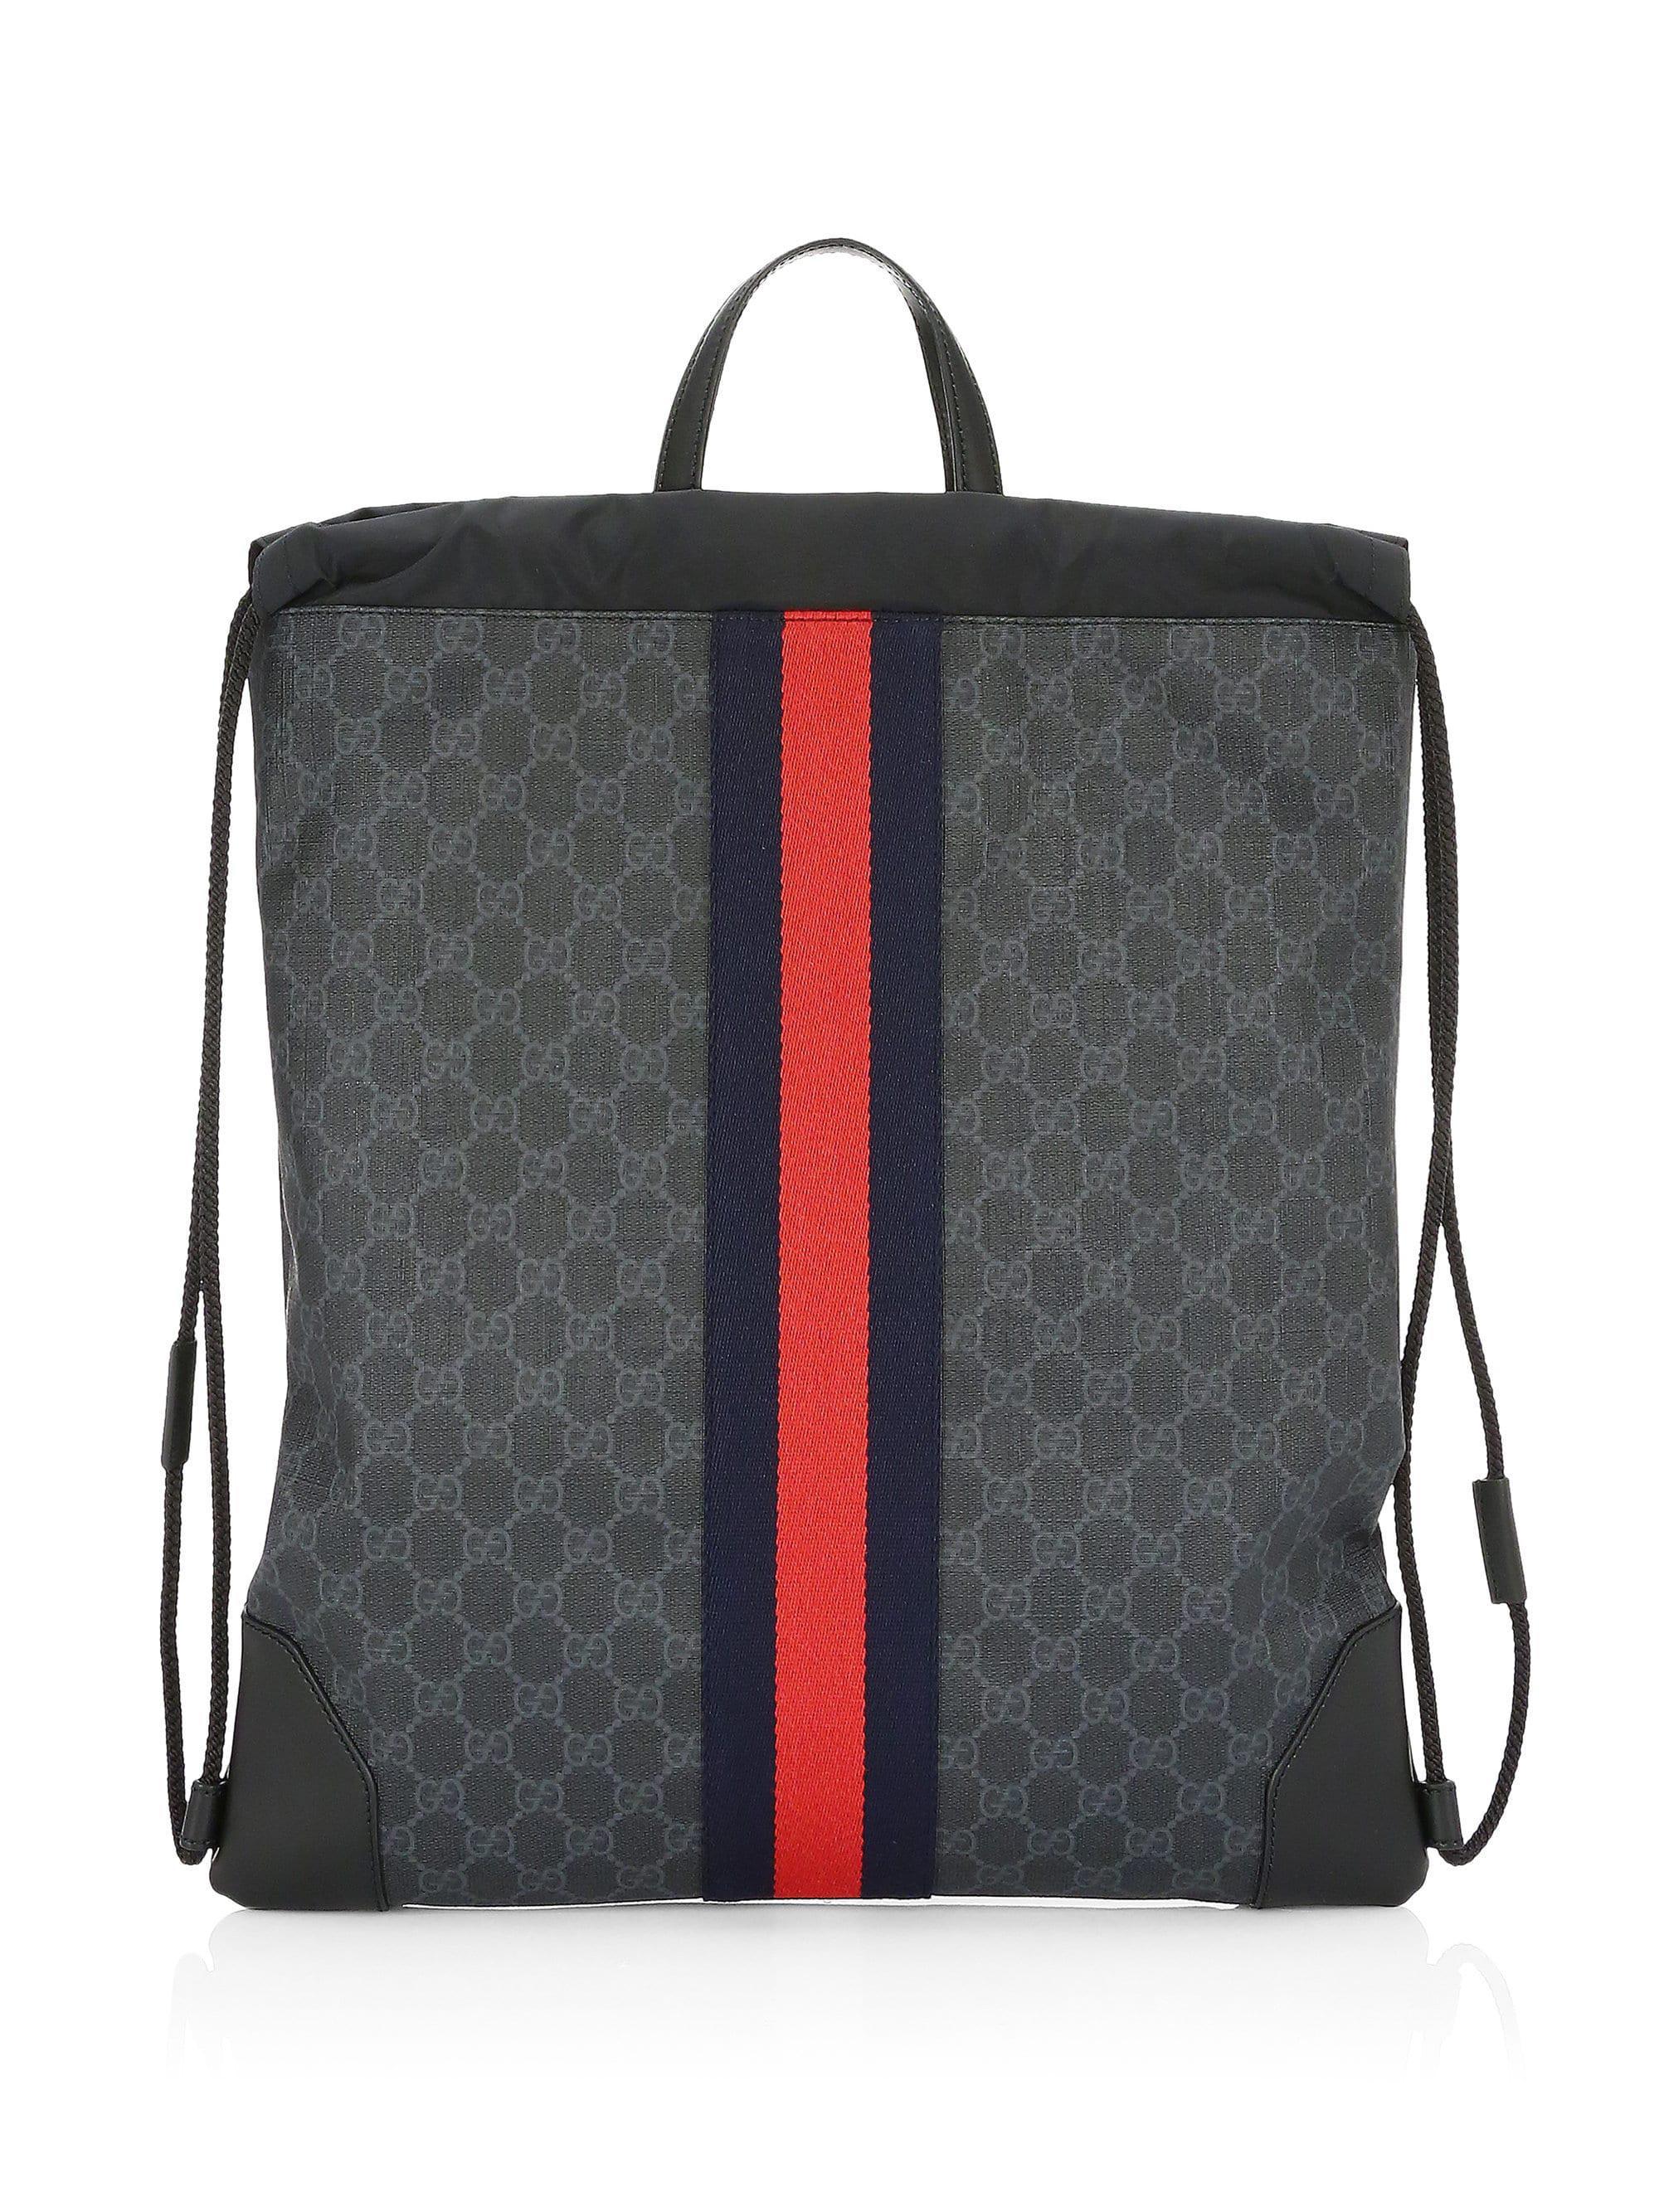 Lyst - Gucci GG Signature Web Drawstring Backpack in Black for Men 022649ec8ccf9